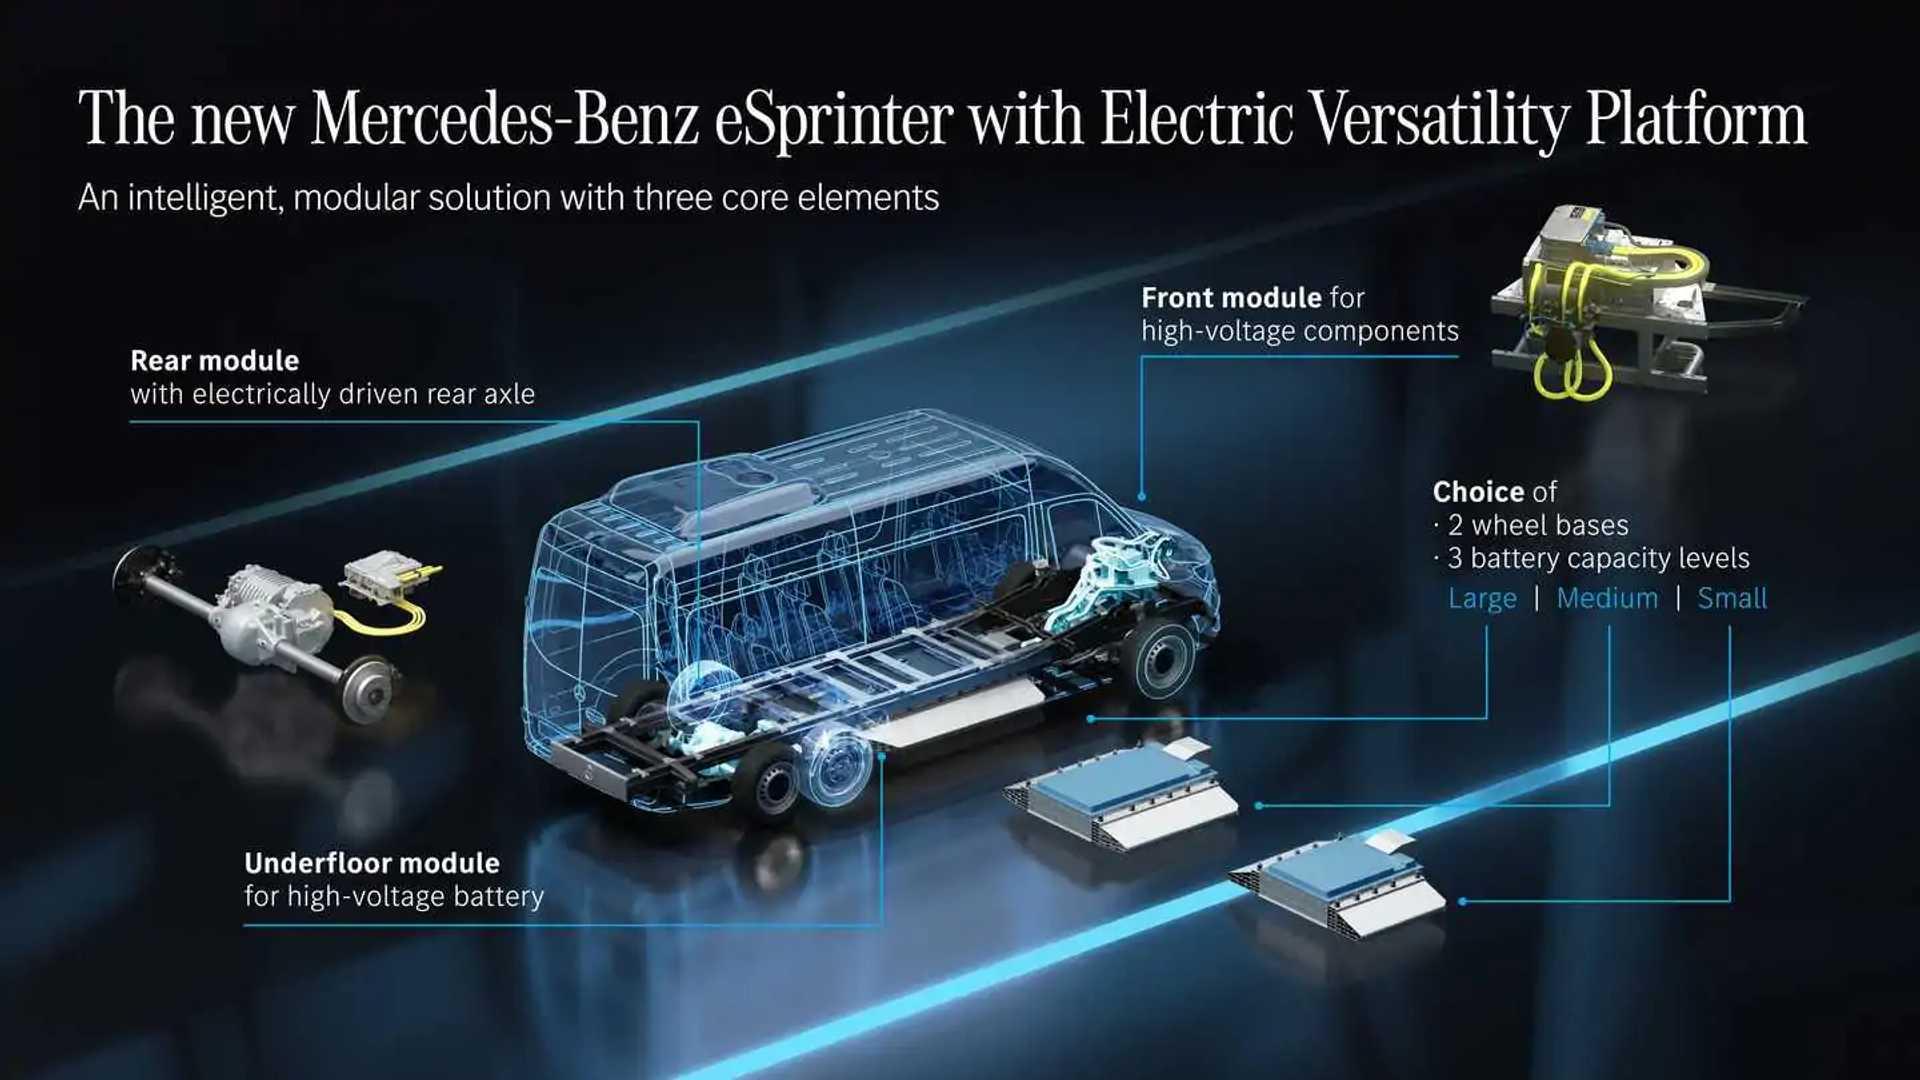 Next-generation Mercedes-Benz eSprinter